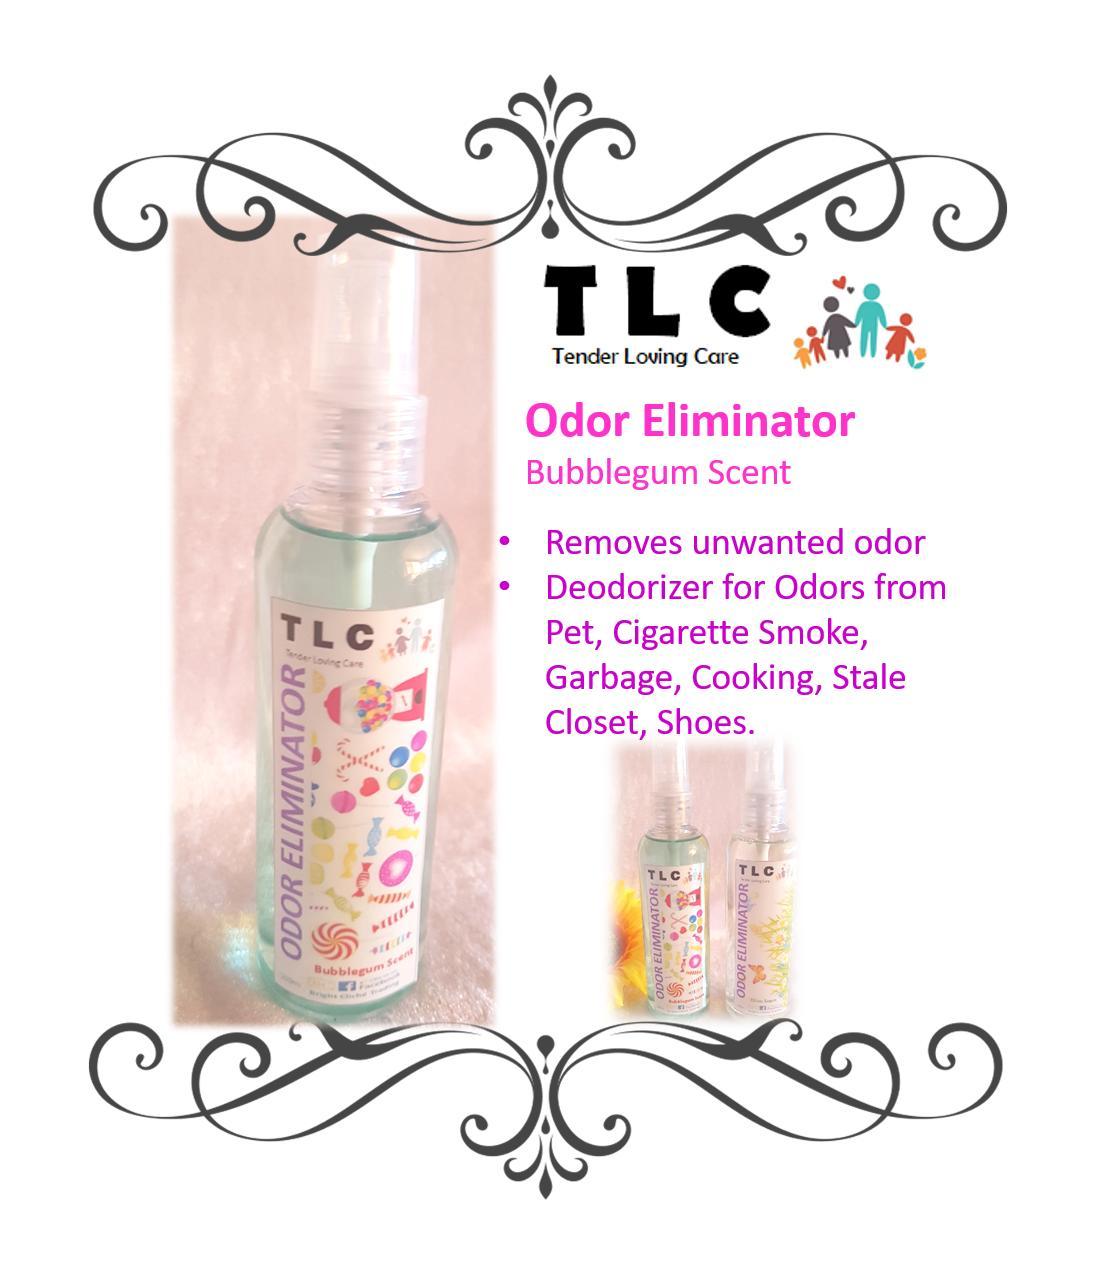 Odor Eliminator With Disinfectant - Bubblegum Scent 100ml By Bright Cliche.